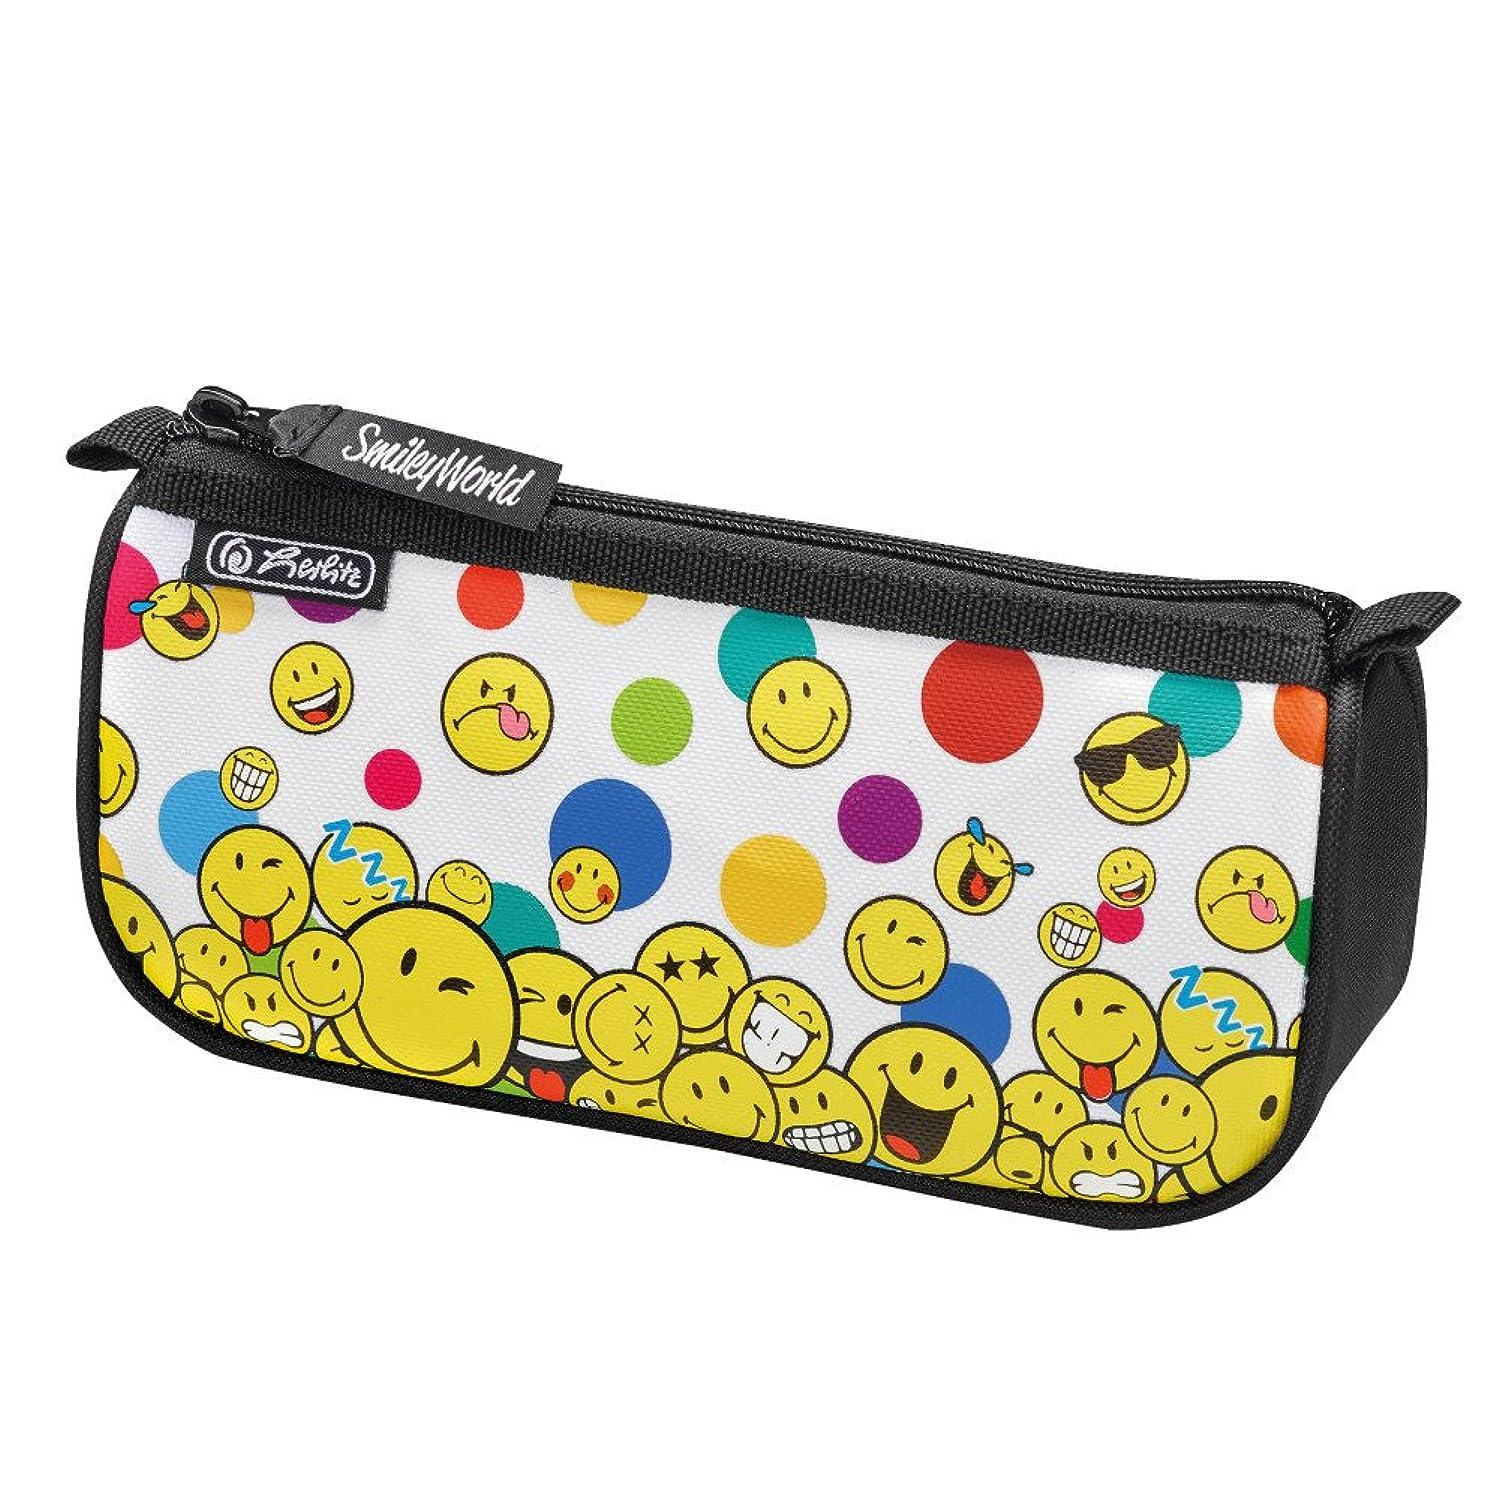 Herlitz Pencil Case, Smiley World Rainbow Faces (Multicolour) - 50015344